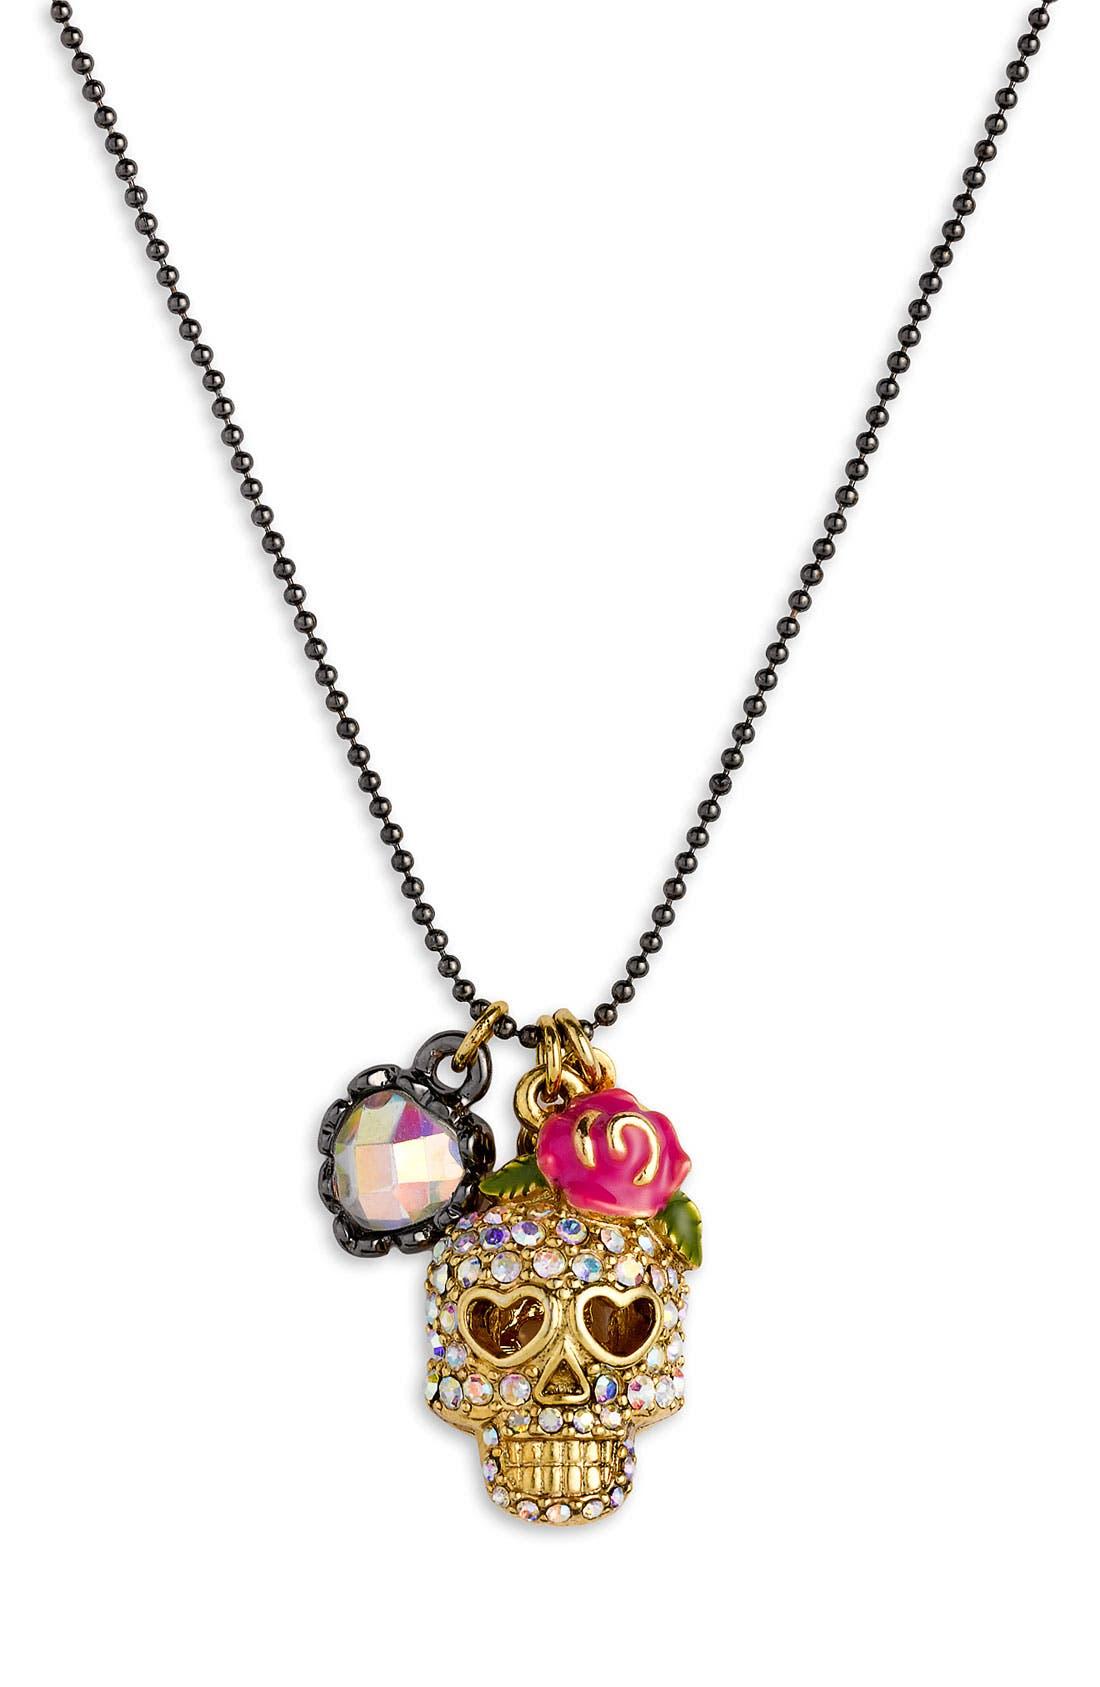 Main Image - Betsey Johnson 'Skull Charm' Necklace